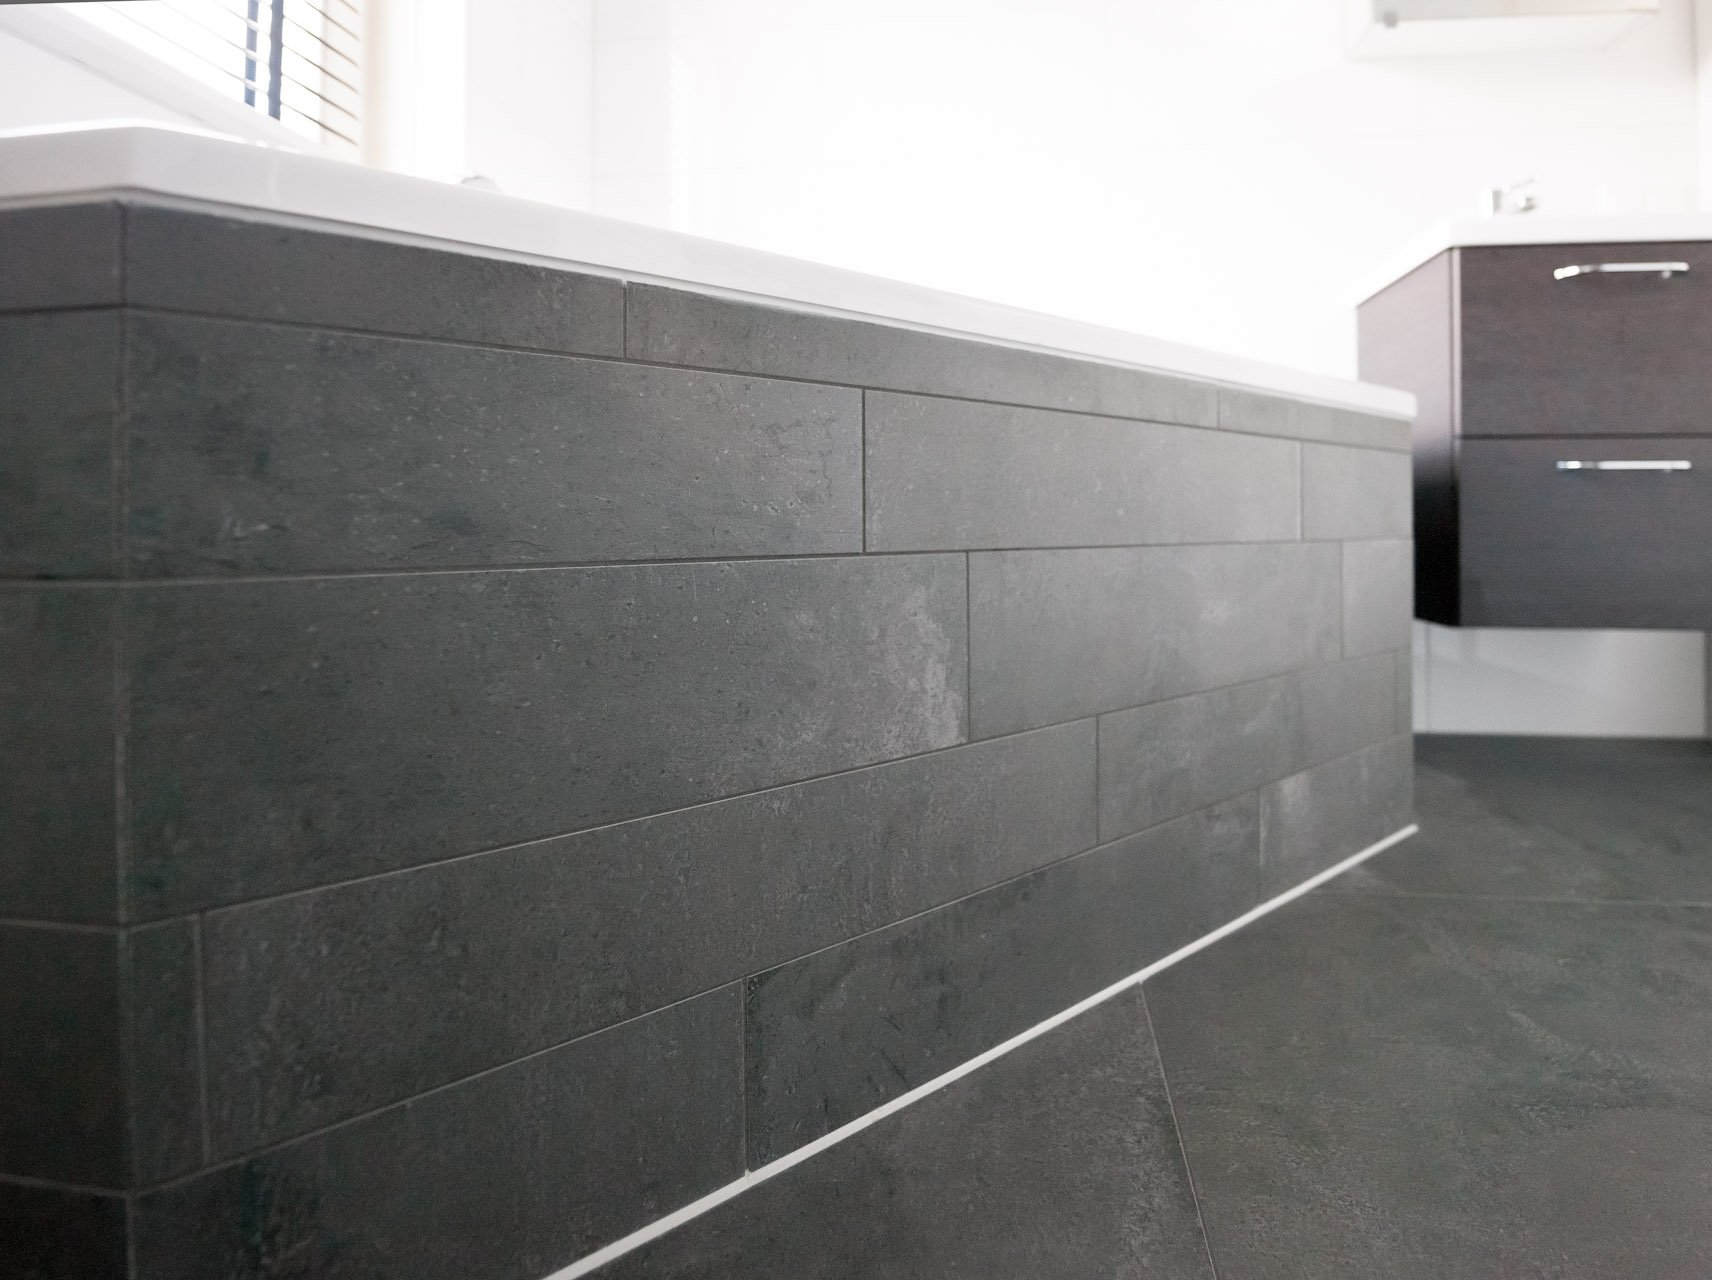 Granieten Vloer Badkamer : Granito vloer verven great soort with granito vloer verven